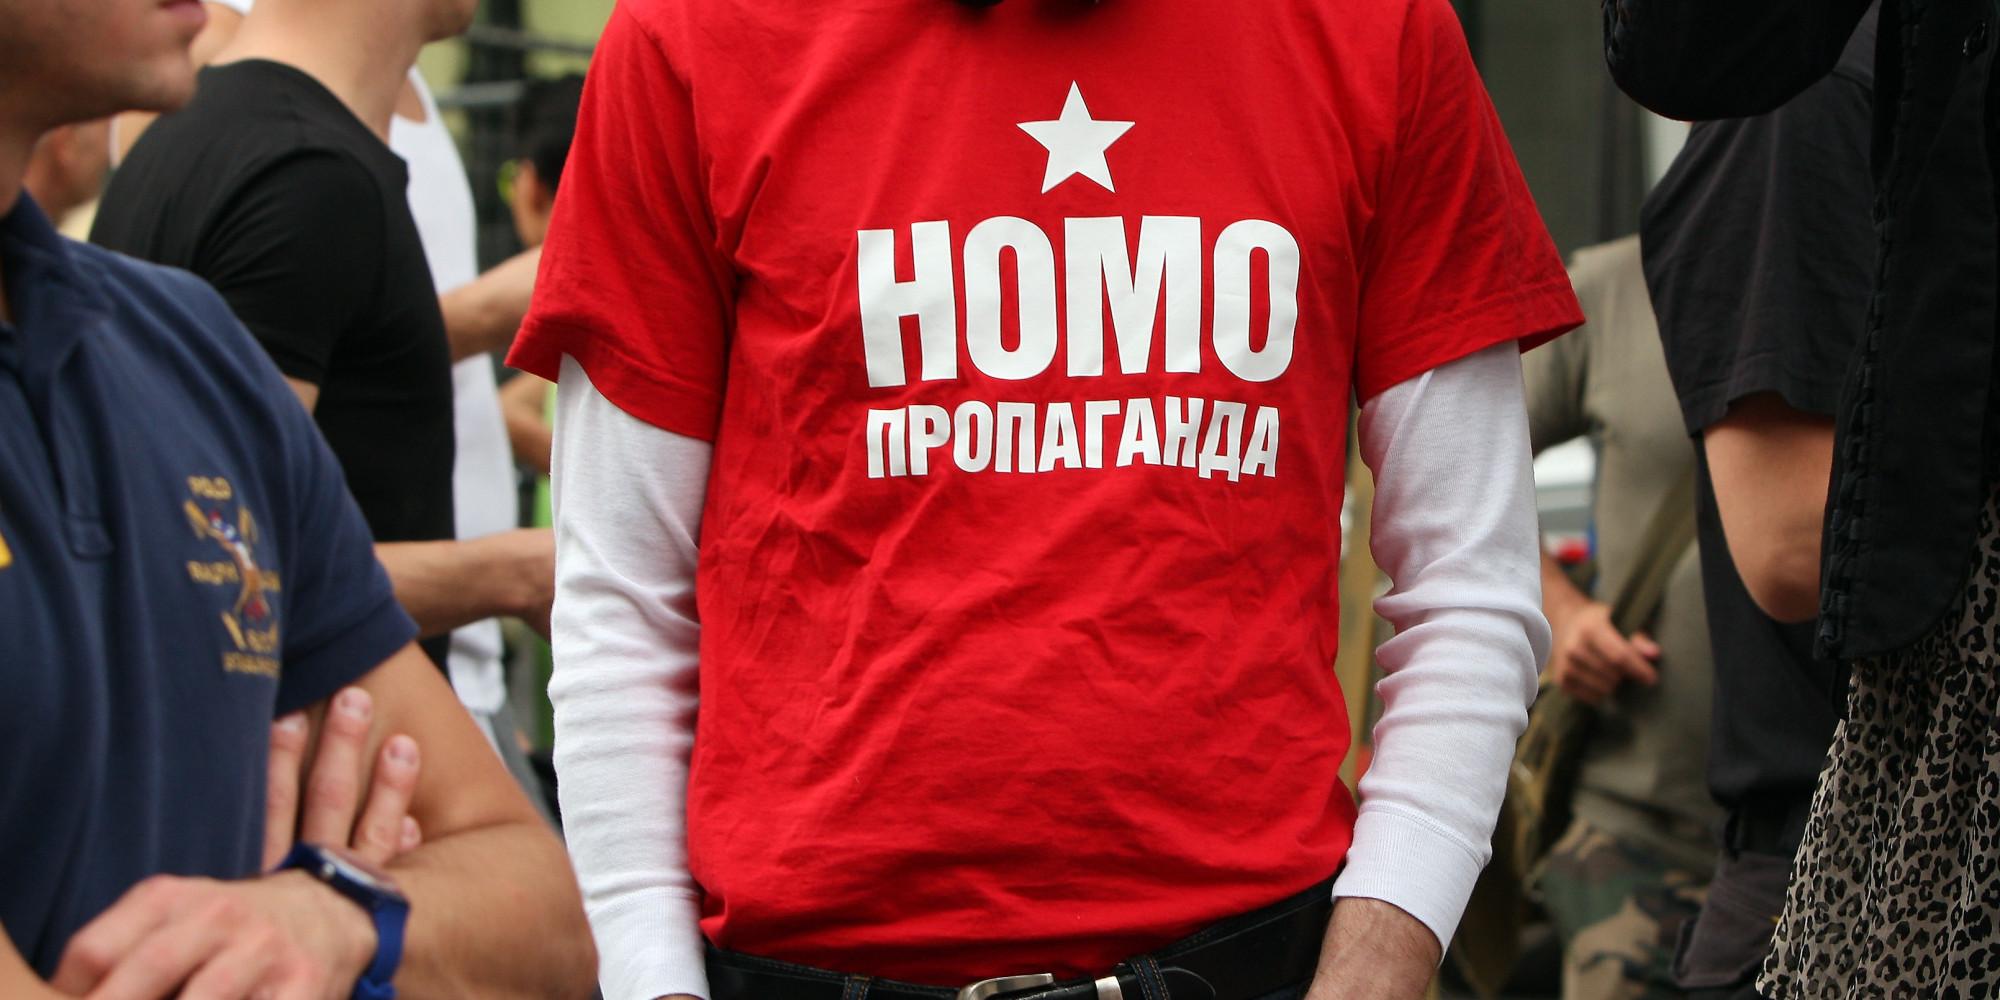 vidéos porno gay agence escort paris